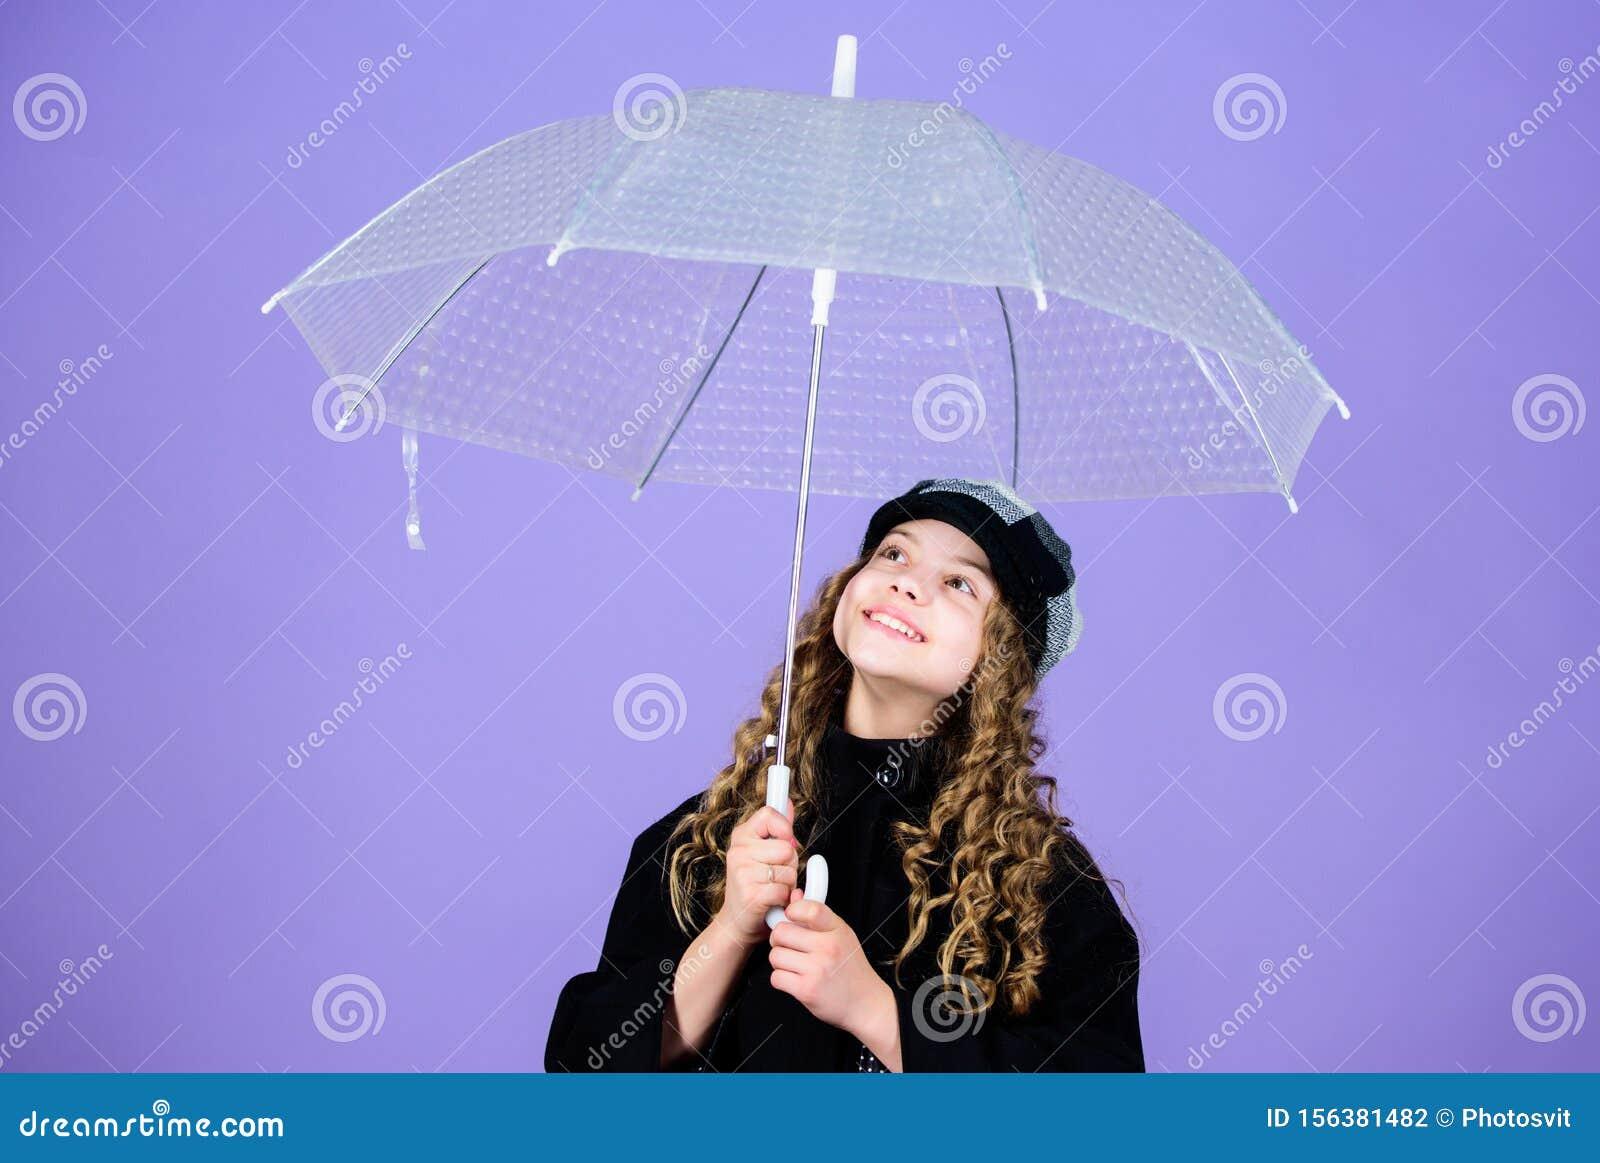 Fall season. Enjoy rain concept. Kids fashion trend. Love rainy days. Kid girl happy hold transparent umbrella. Enjoy